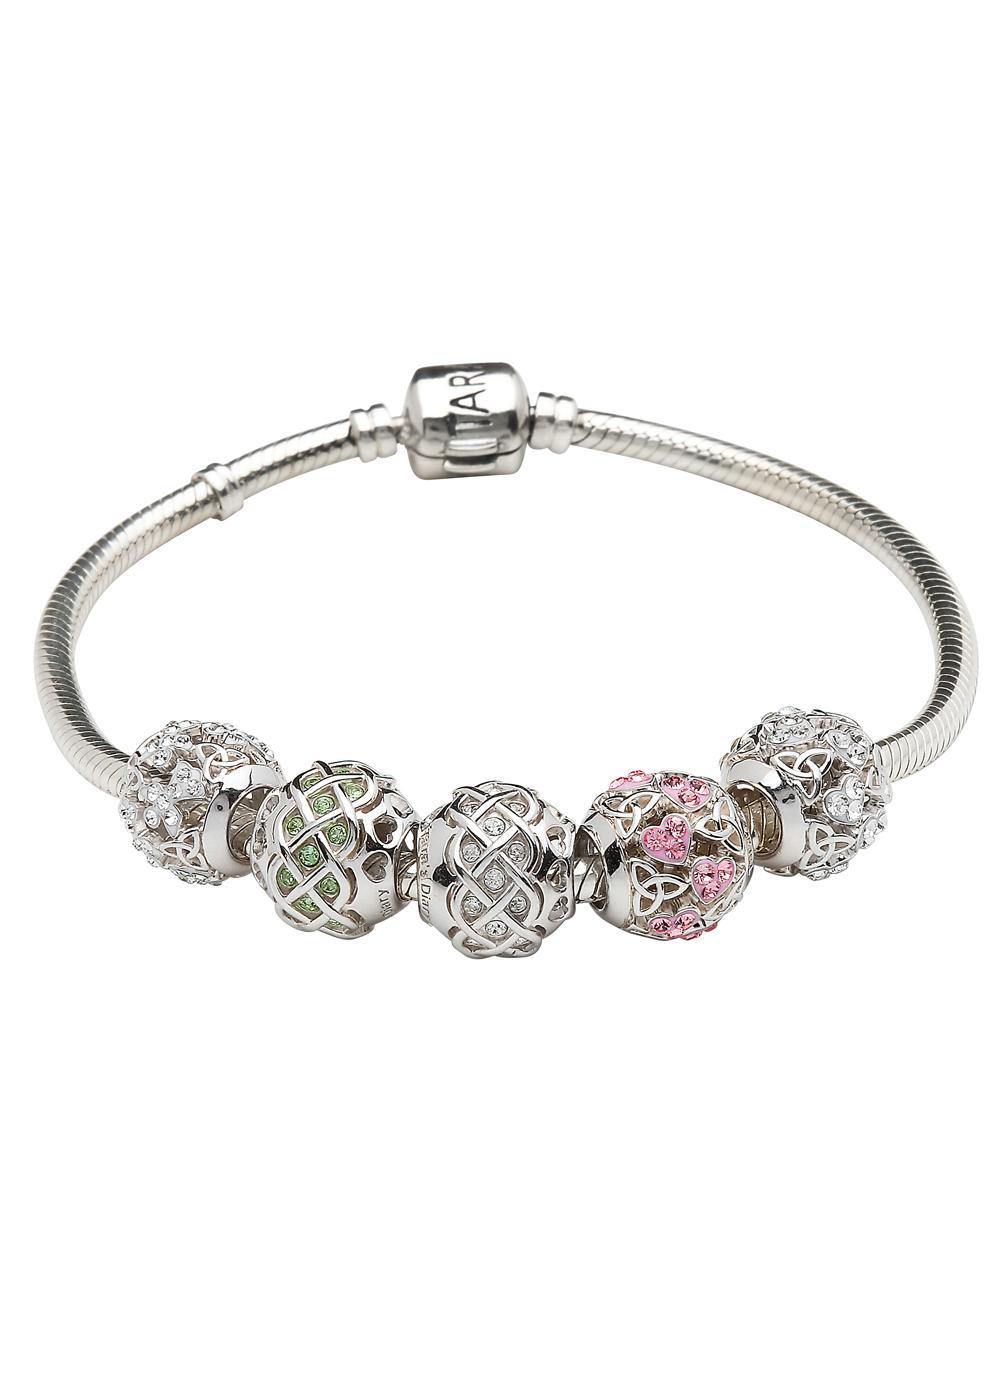 Trinity & Heart Pink Bead Embellished With Swarovski